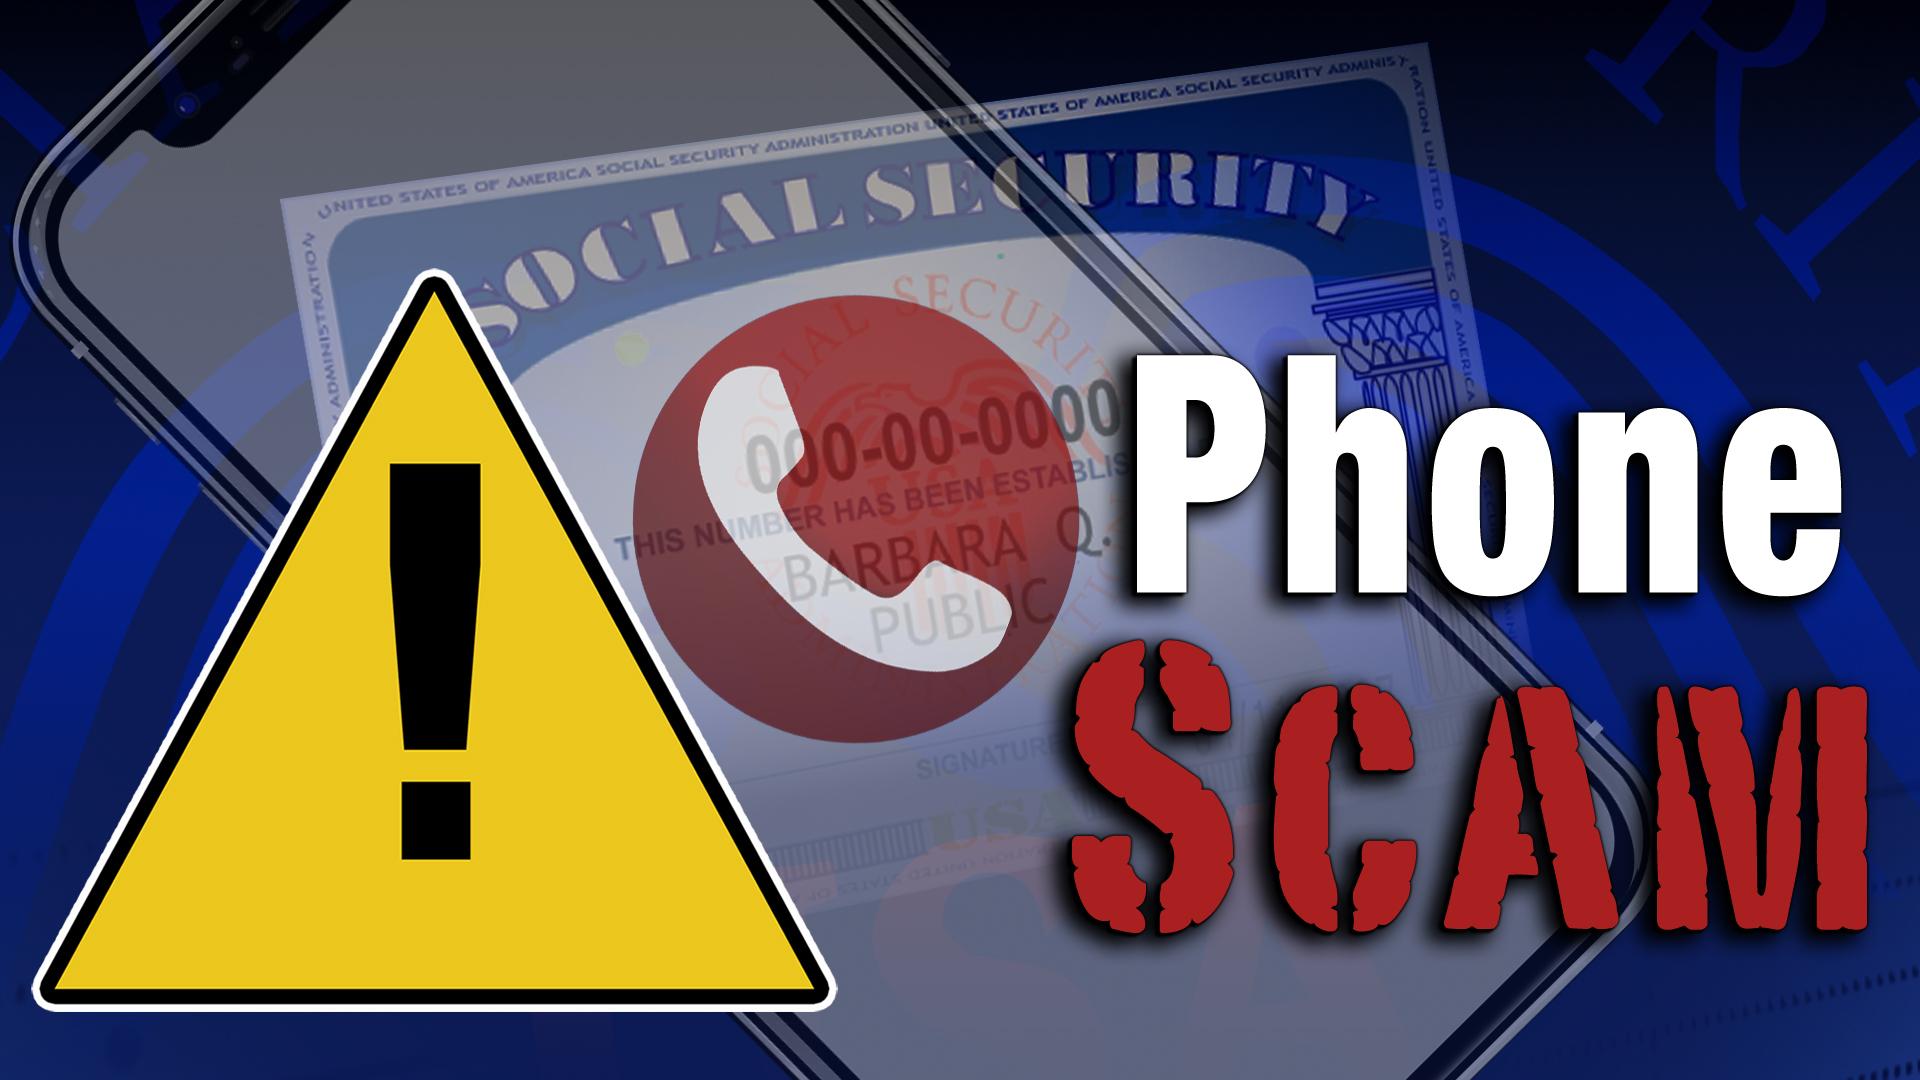 Social_Security_Phone_Scam_1560031245645-159665.jpg